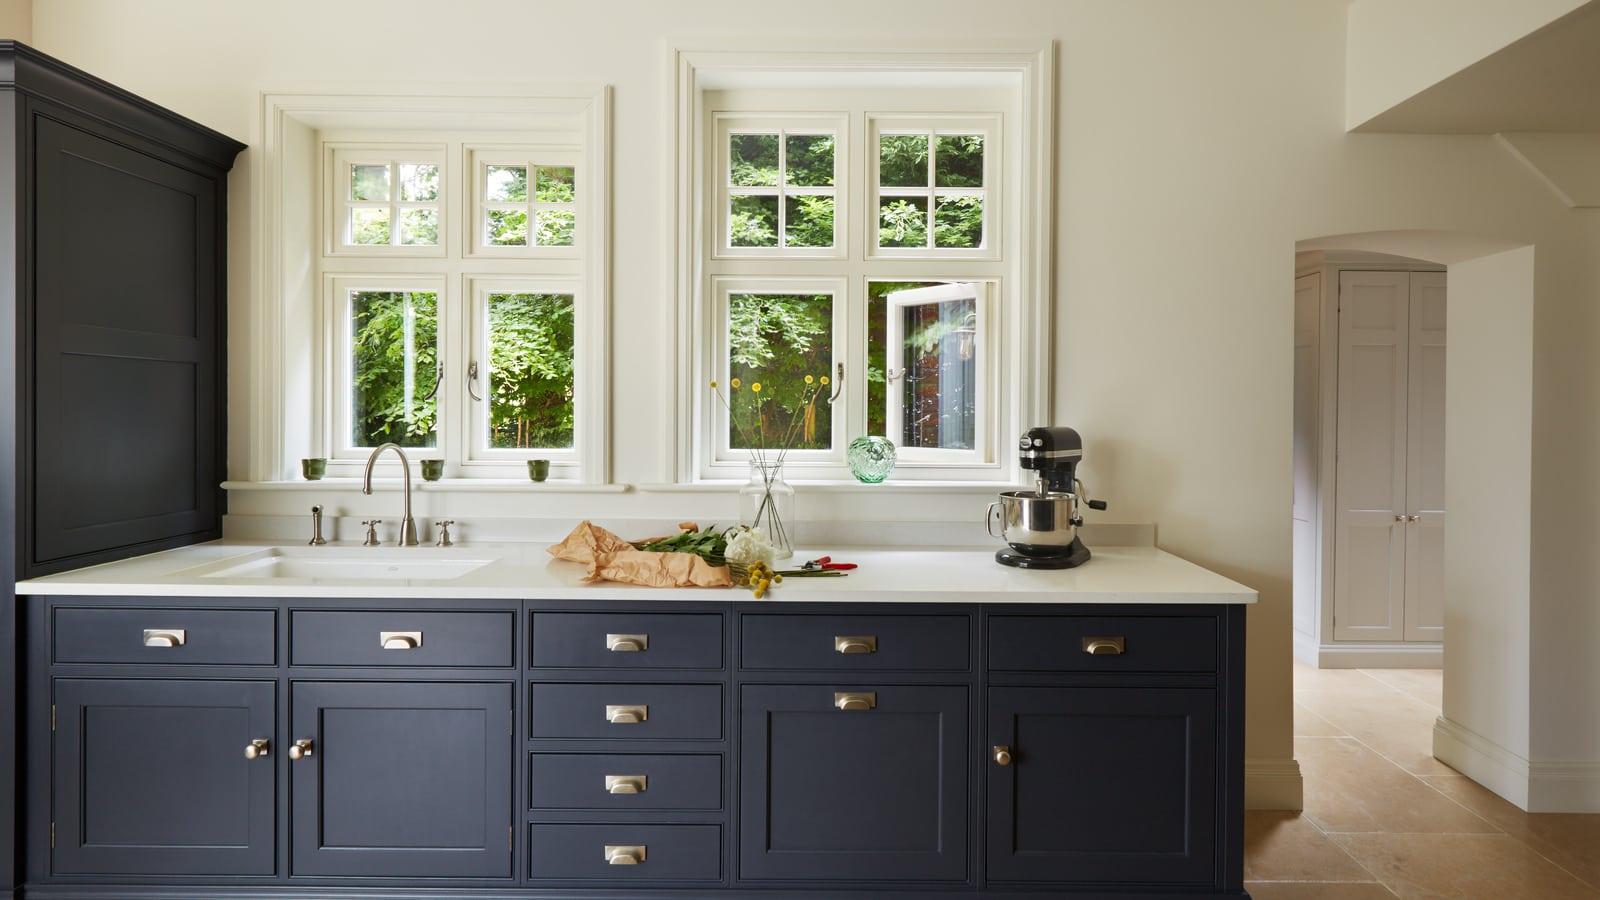 Westbury kitchen extension with casement timber windows